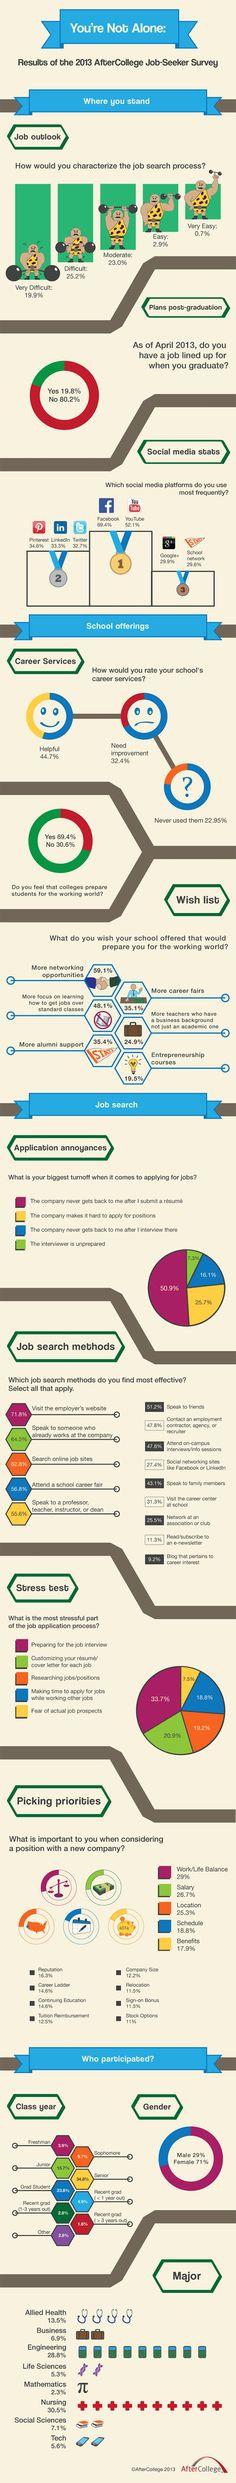 Should you apply if you donu0027t meet the job qualifications? Job - job qualifications